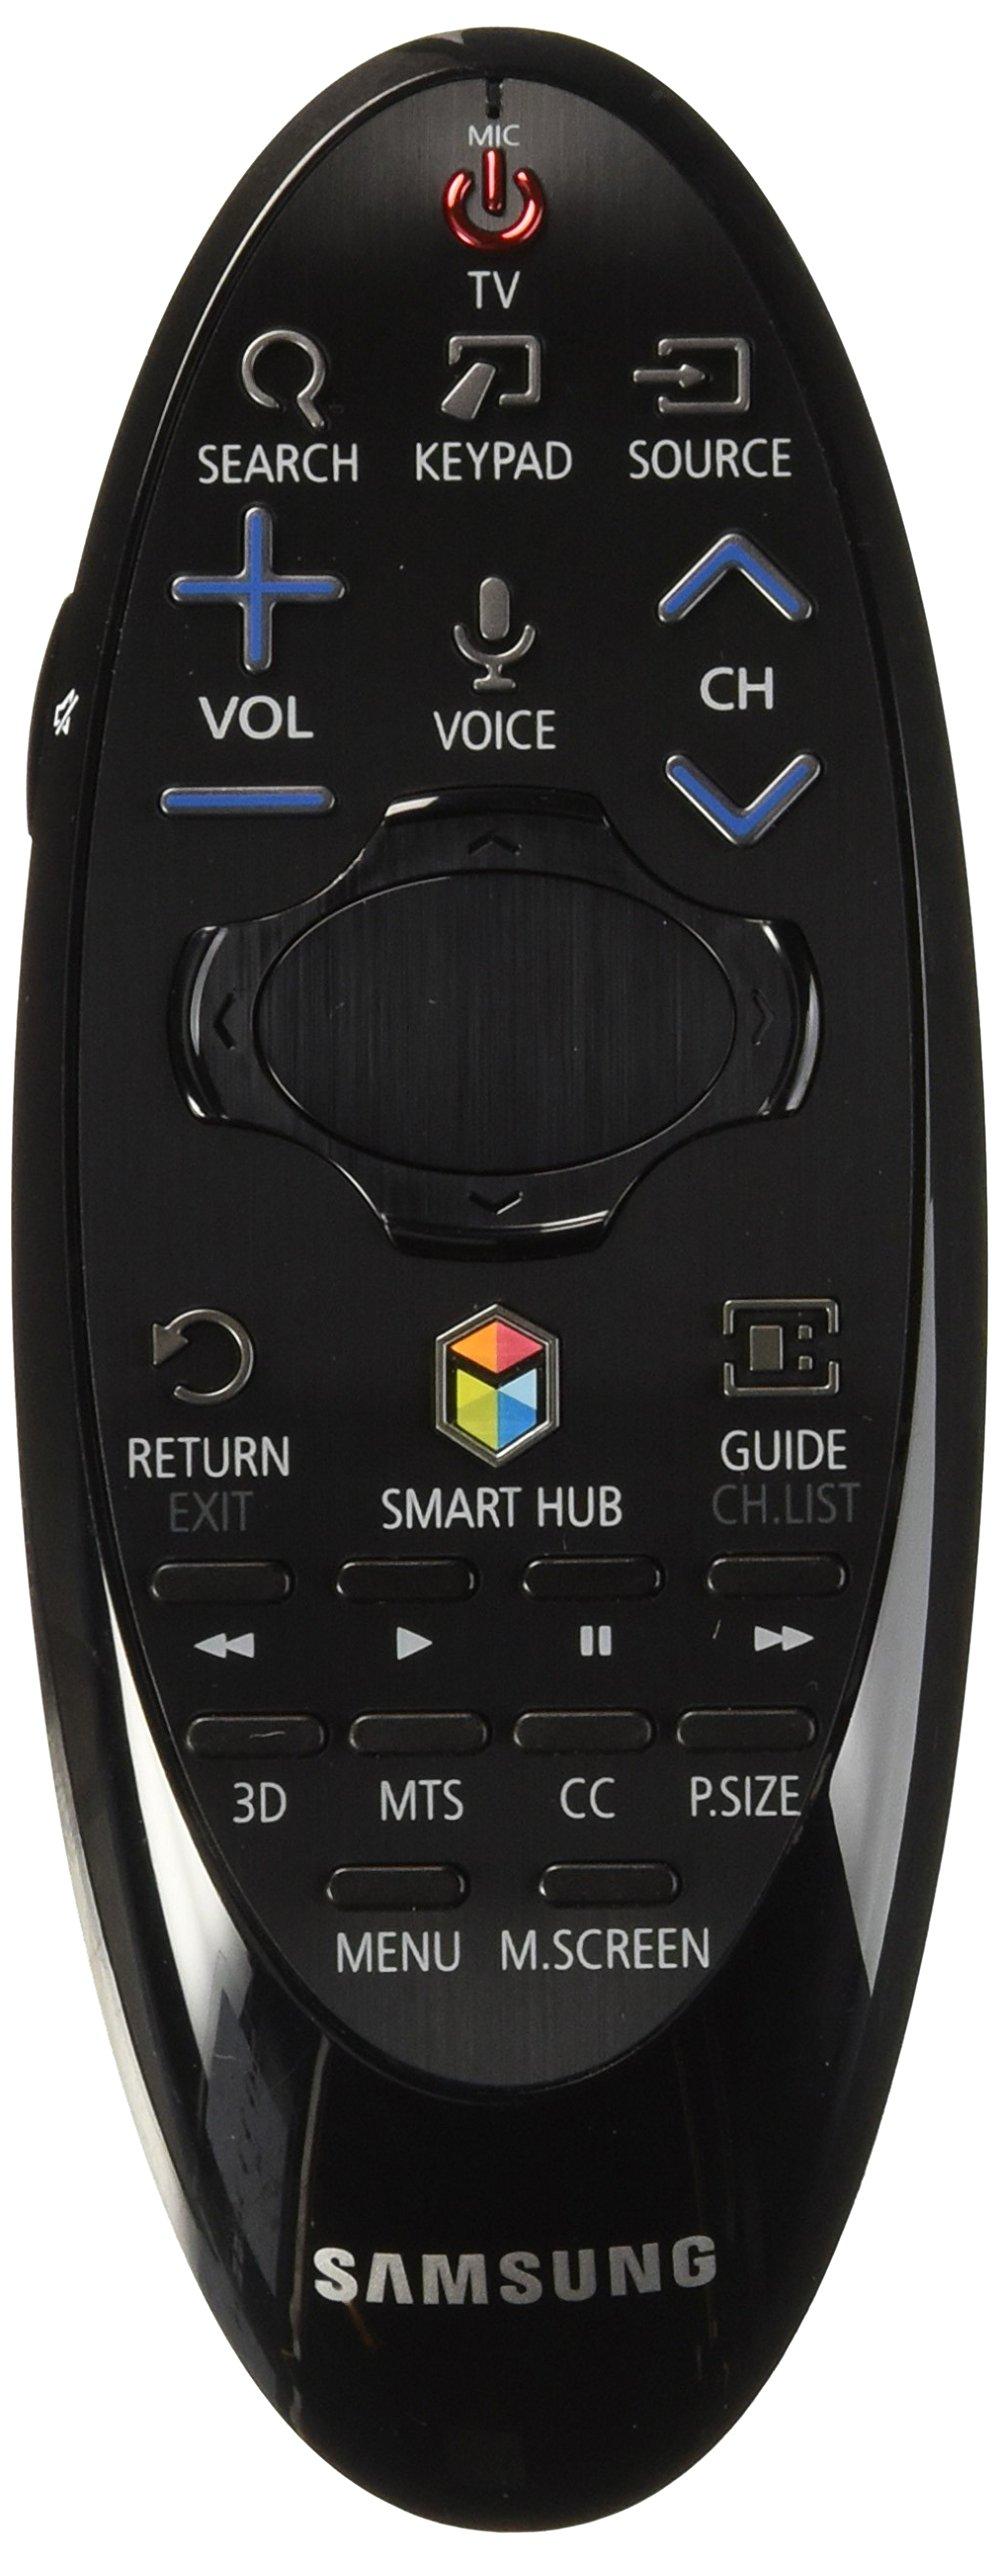 Samsung BN59-01185A Remote Control by Samsung